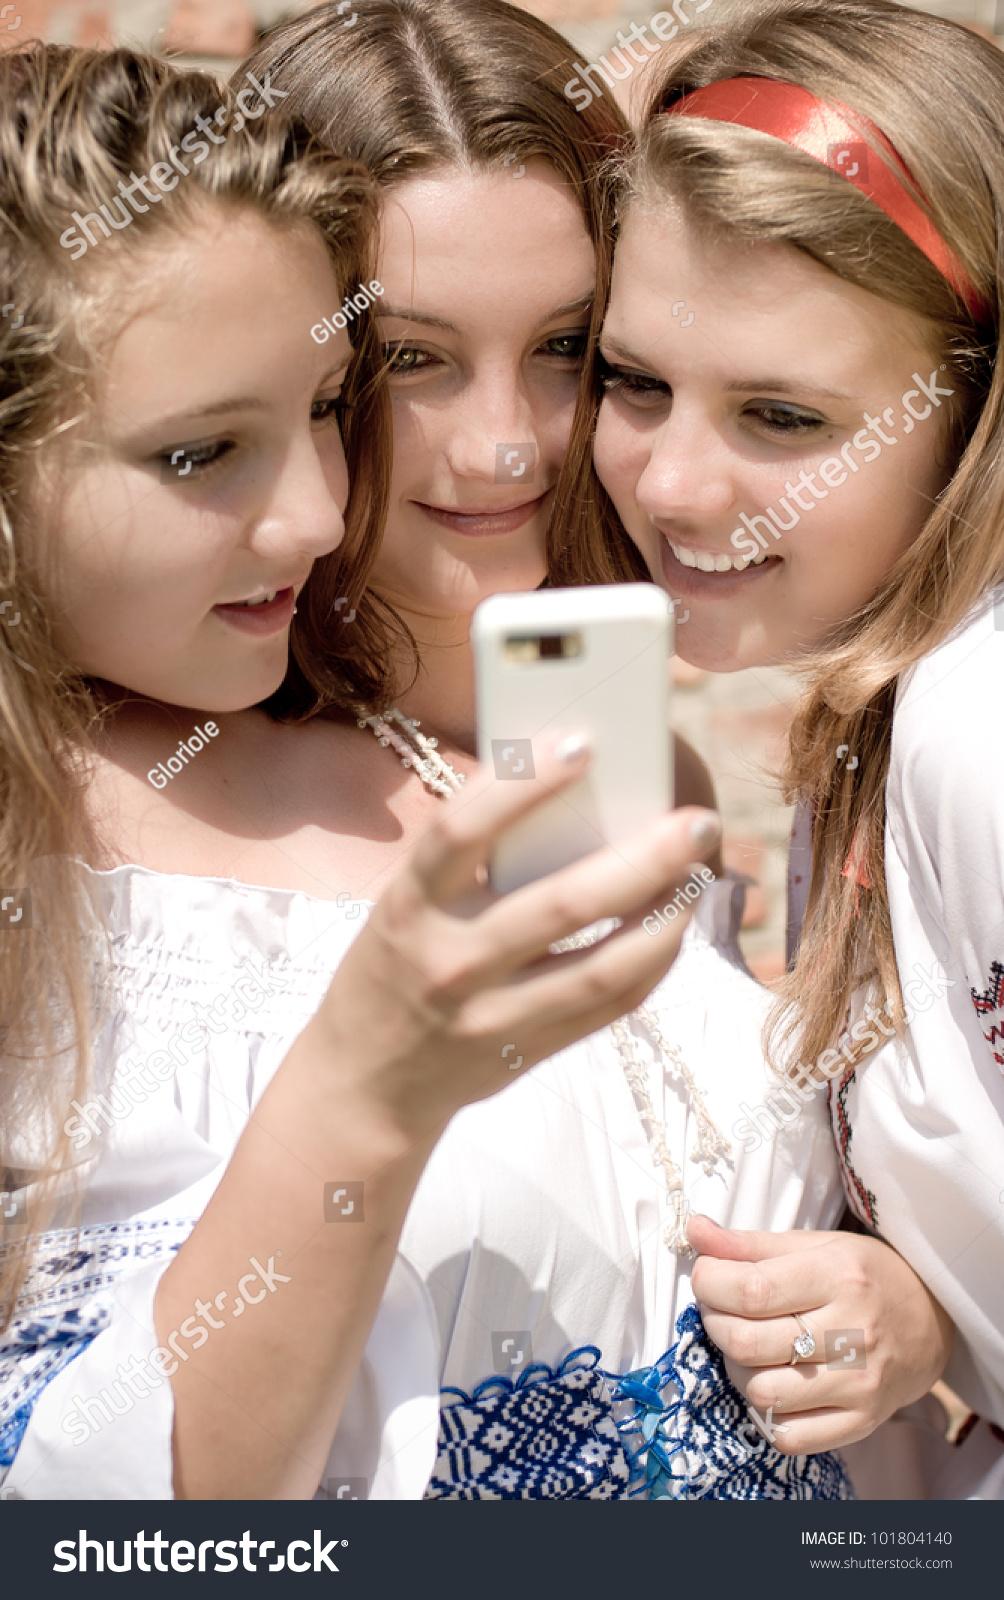 twink-pics-digital-teen-girls